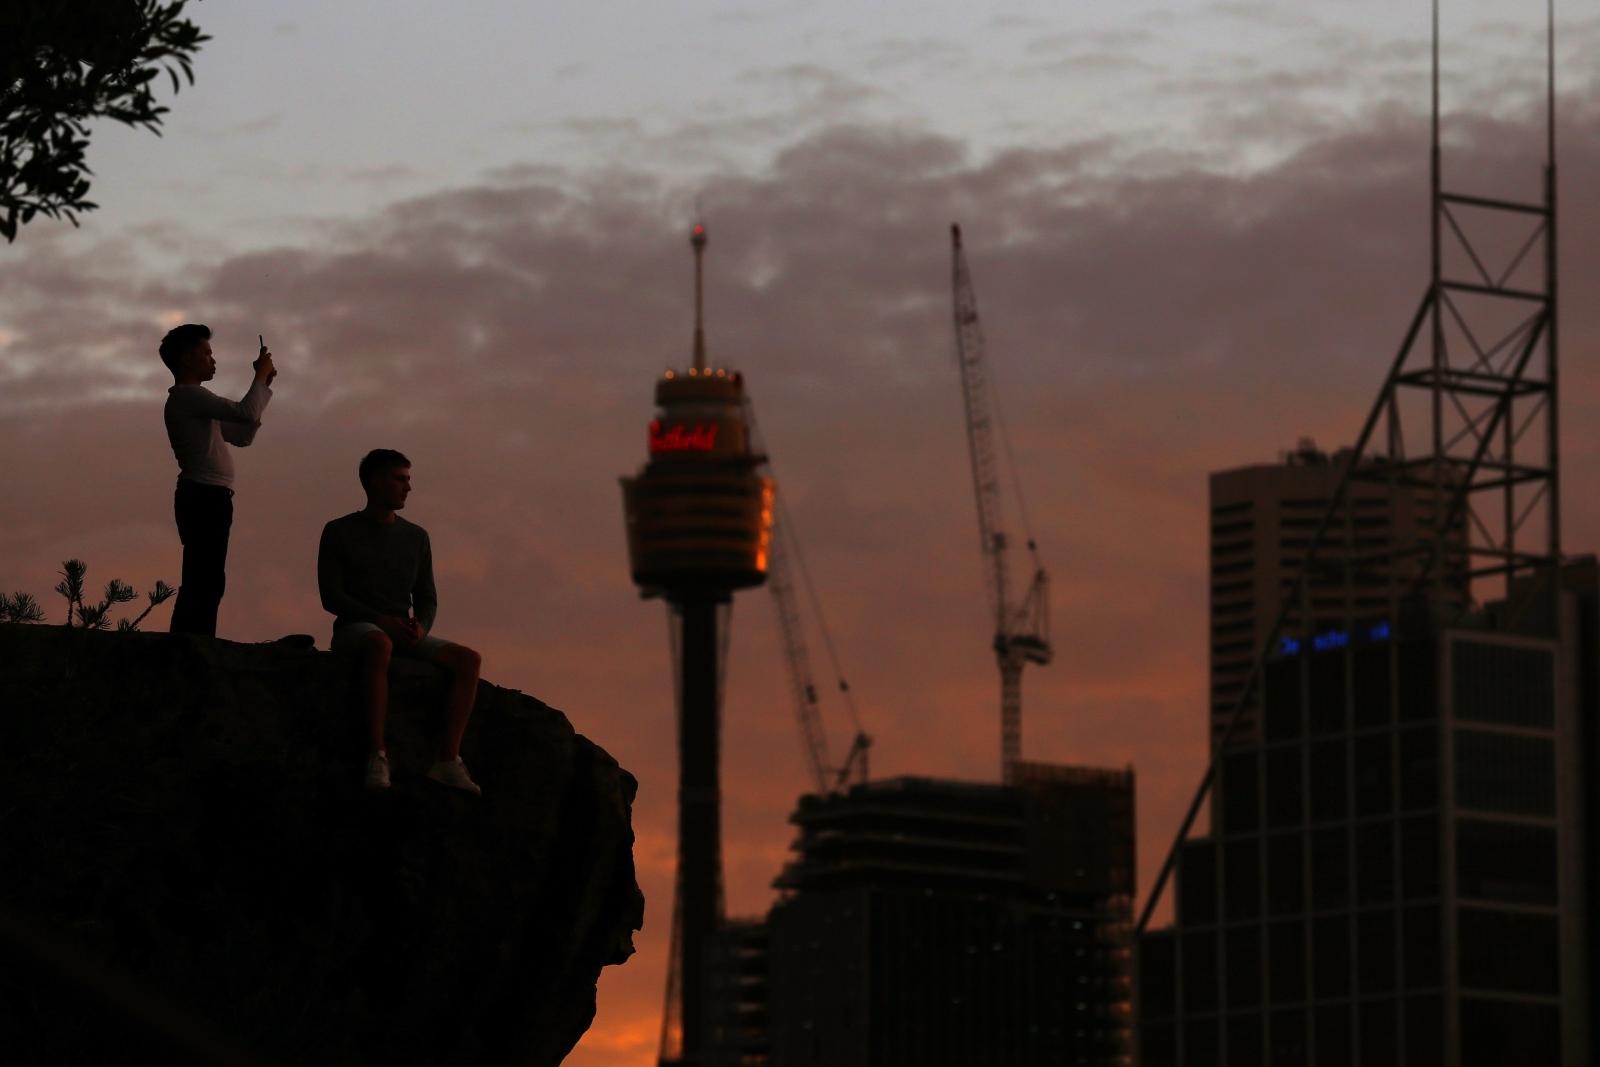 Australia, zachód słońca   EPA/STEVEN SAPHORE